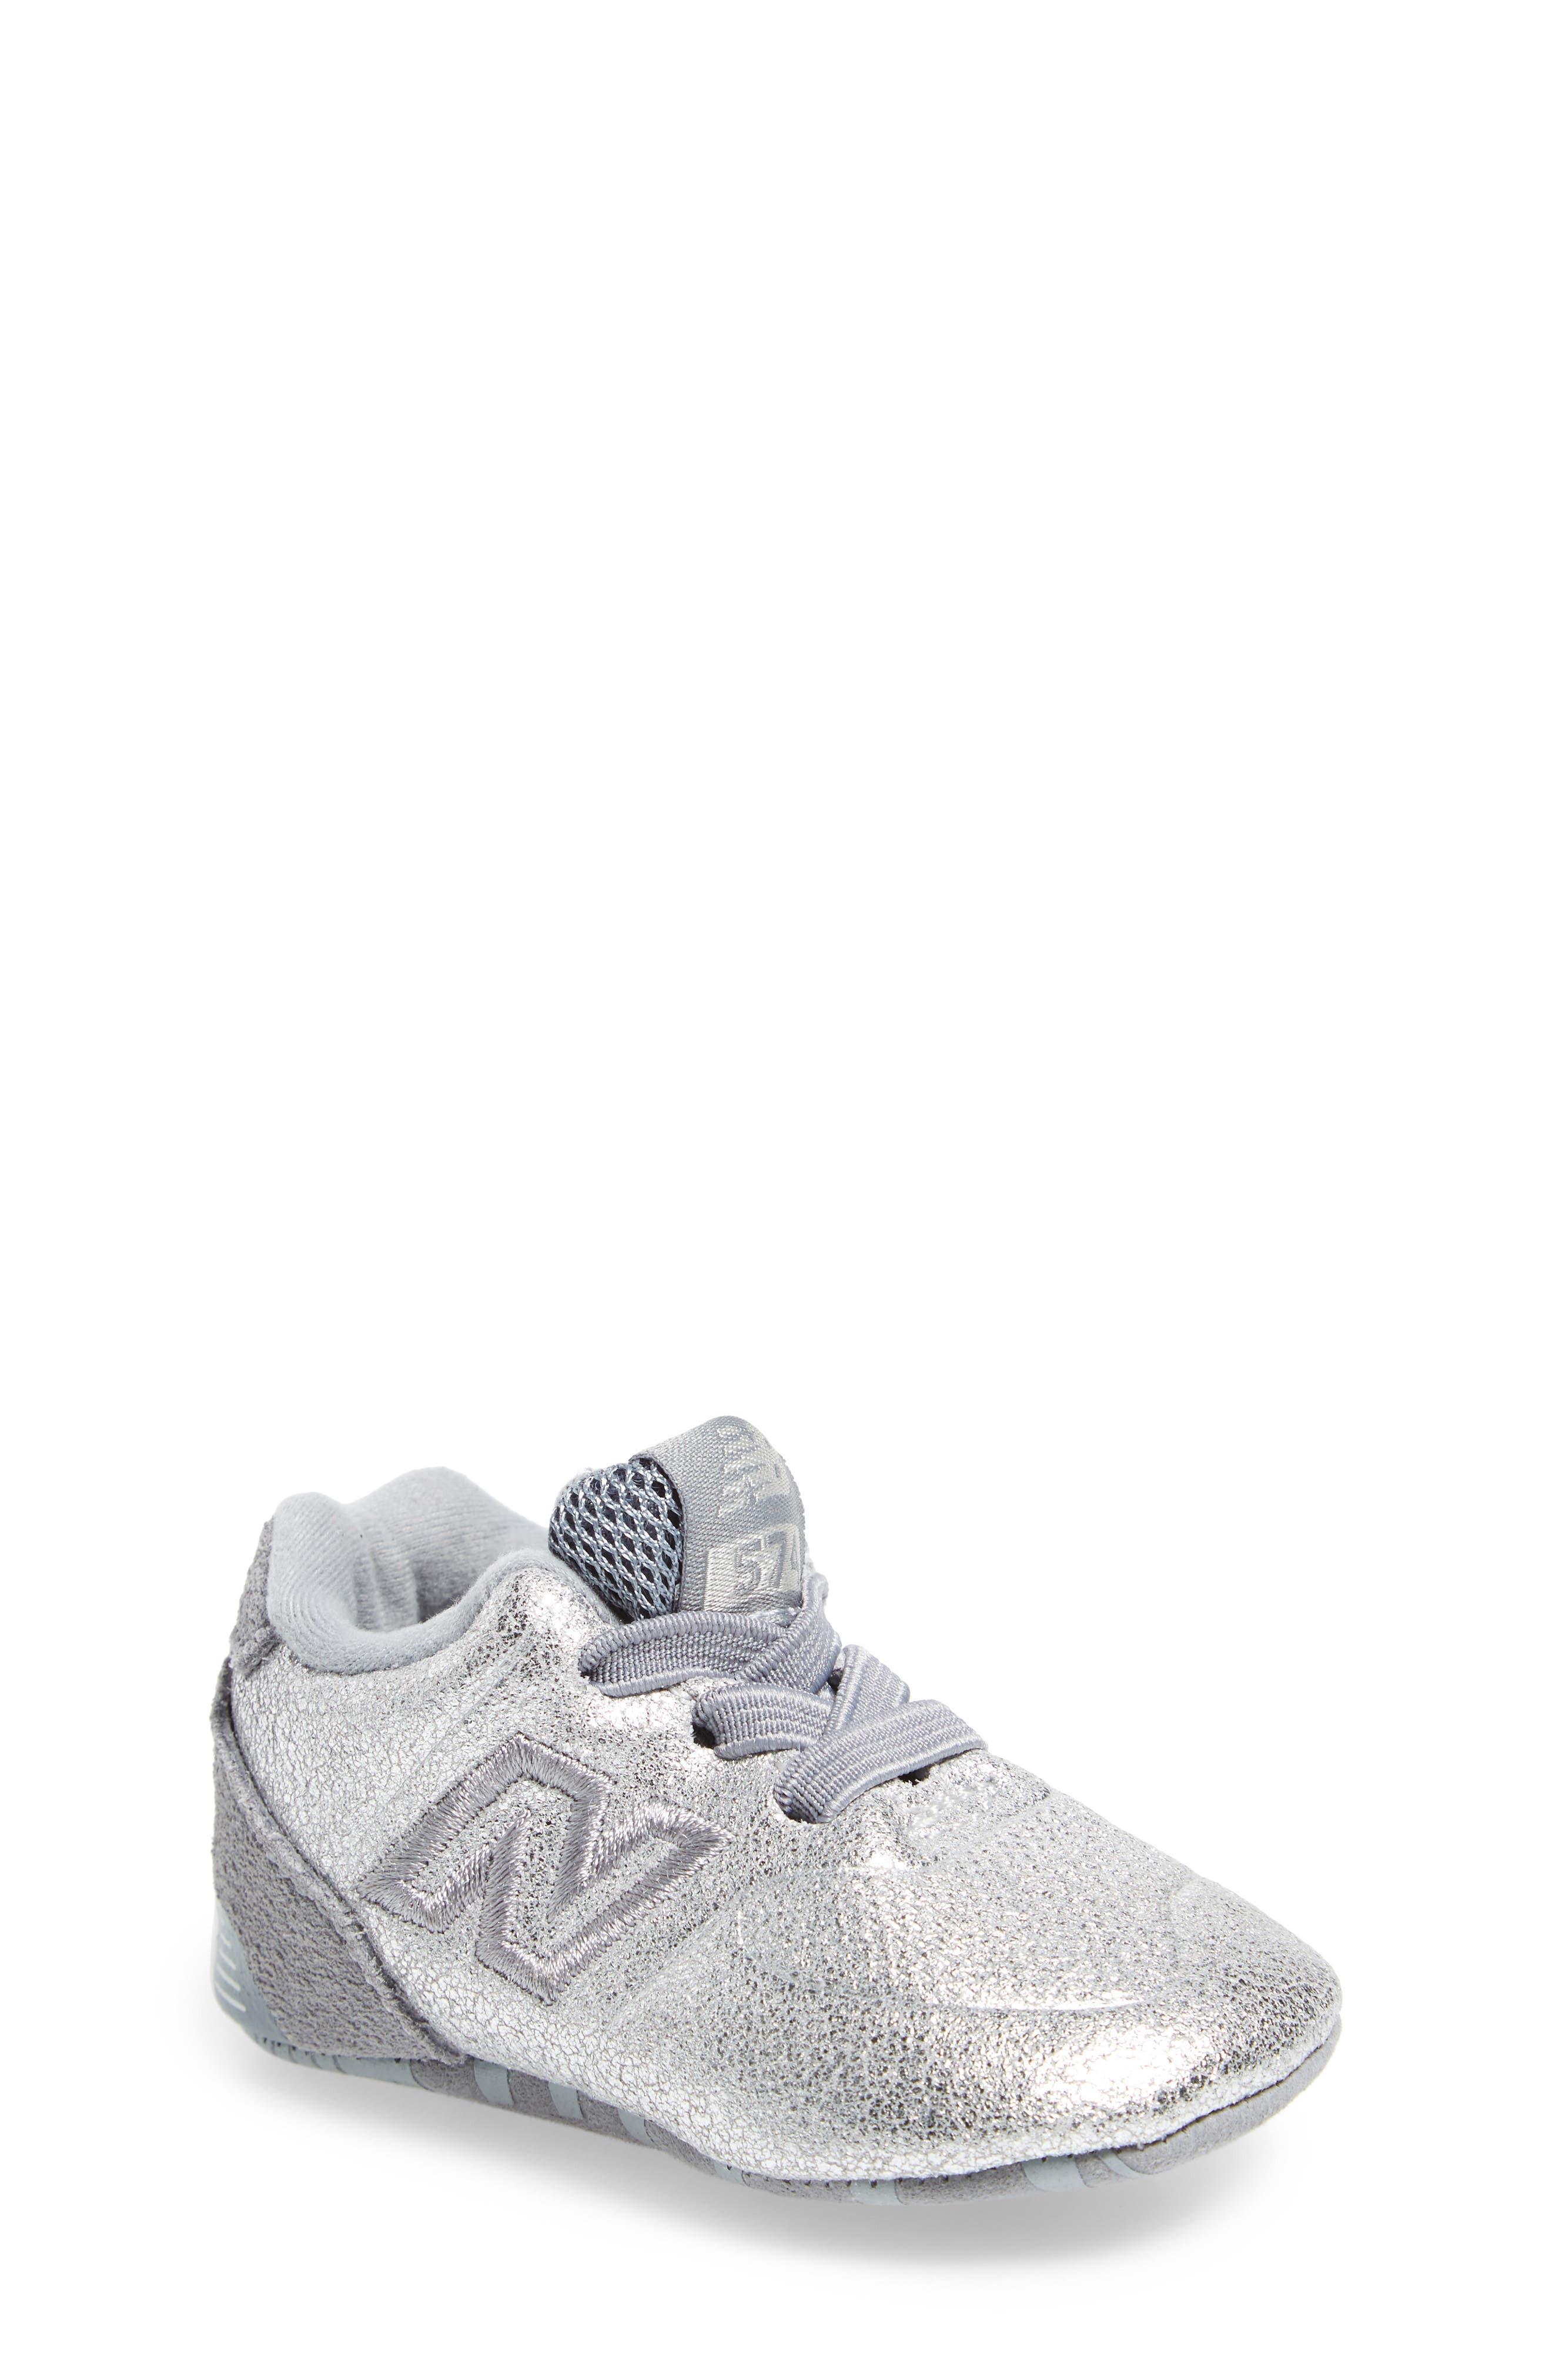 574 Metallic Crib Sneaker,                             Main thumbnail 1, color,                             040